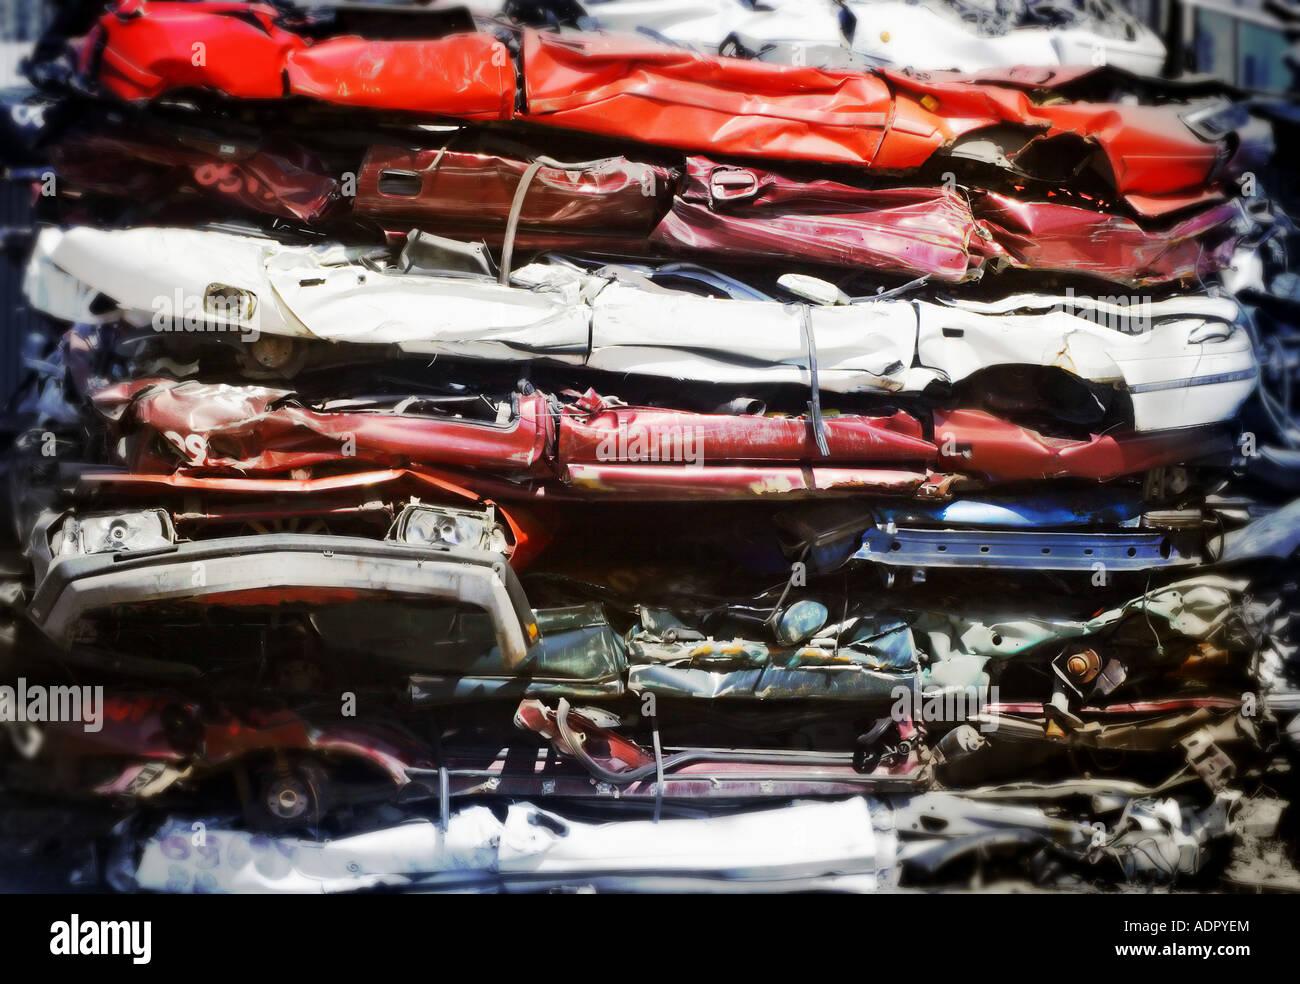 Junkyard full of smashed cars Stock Photo: 13475227 - Alamy